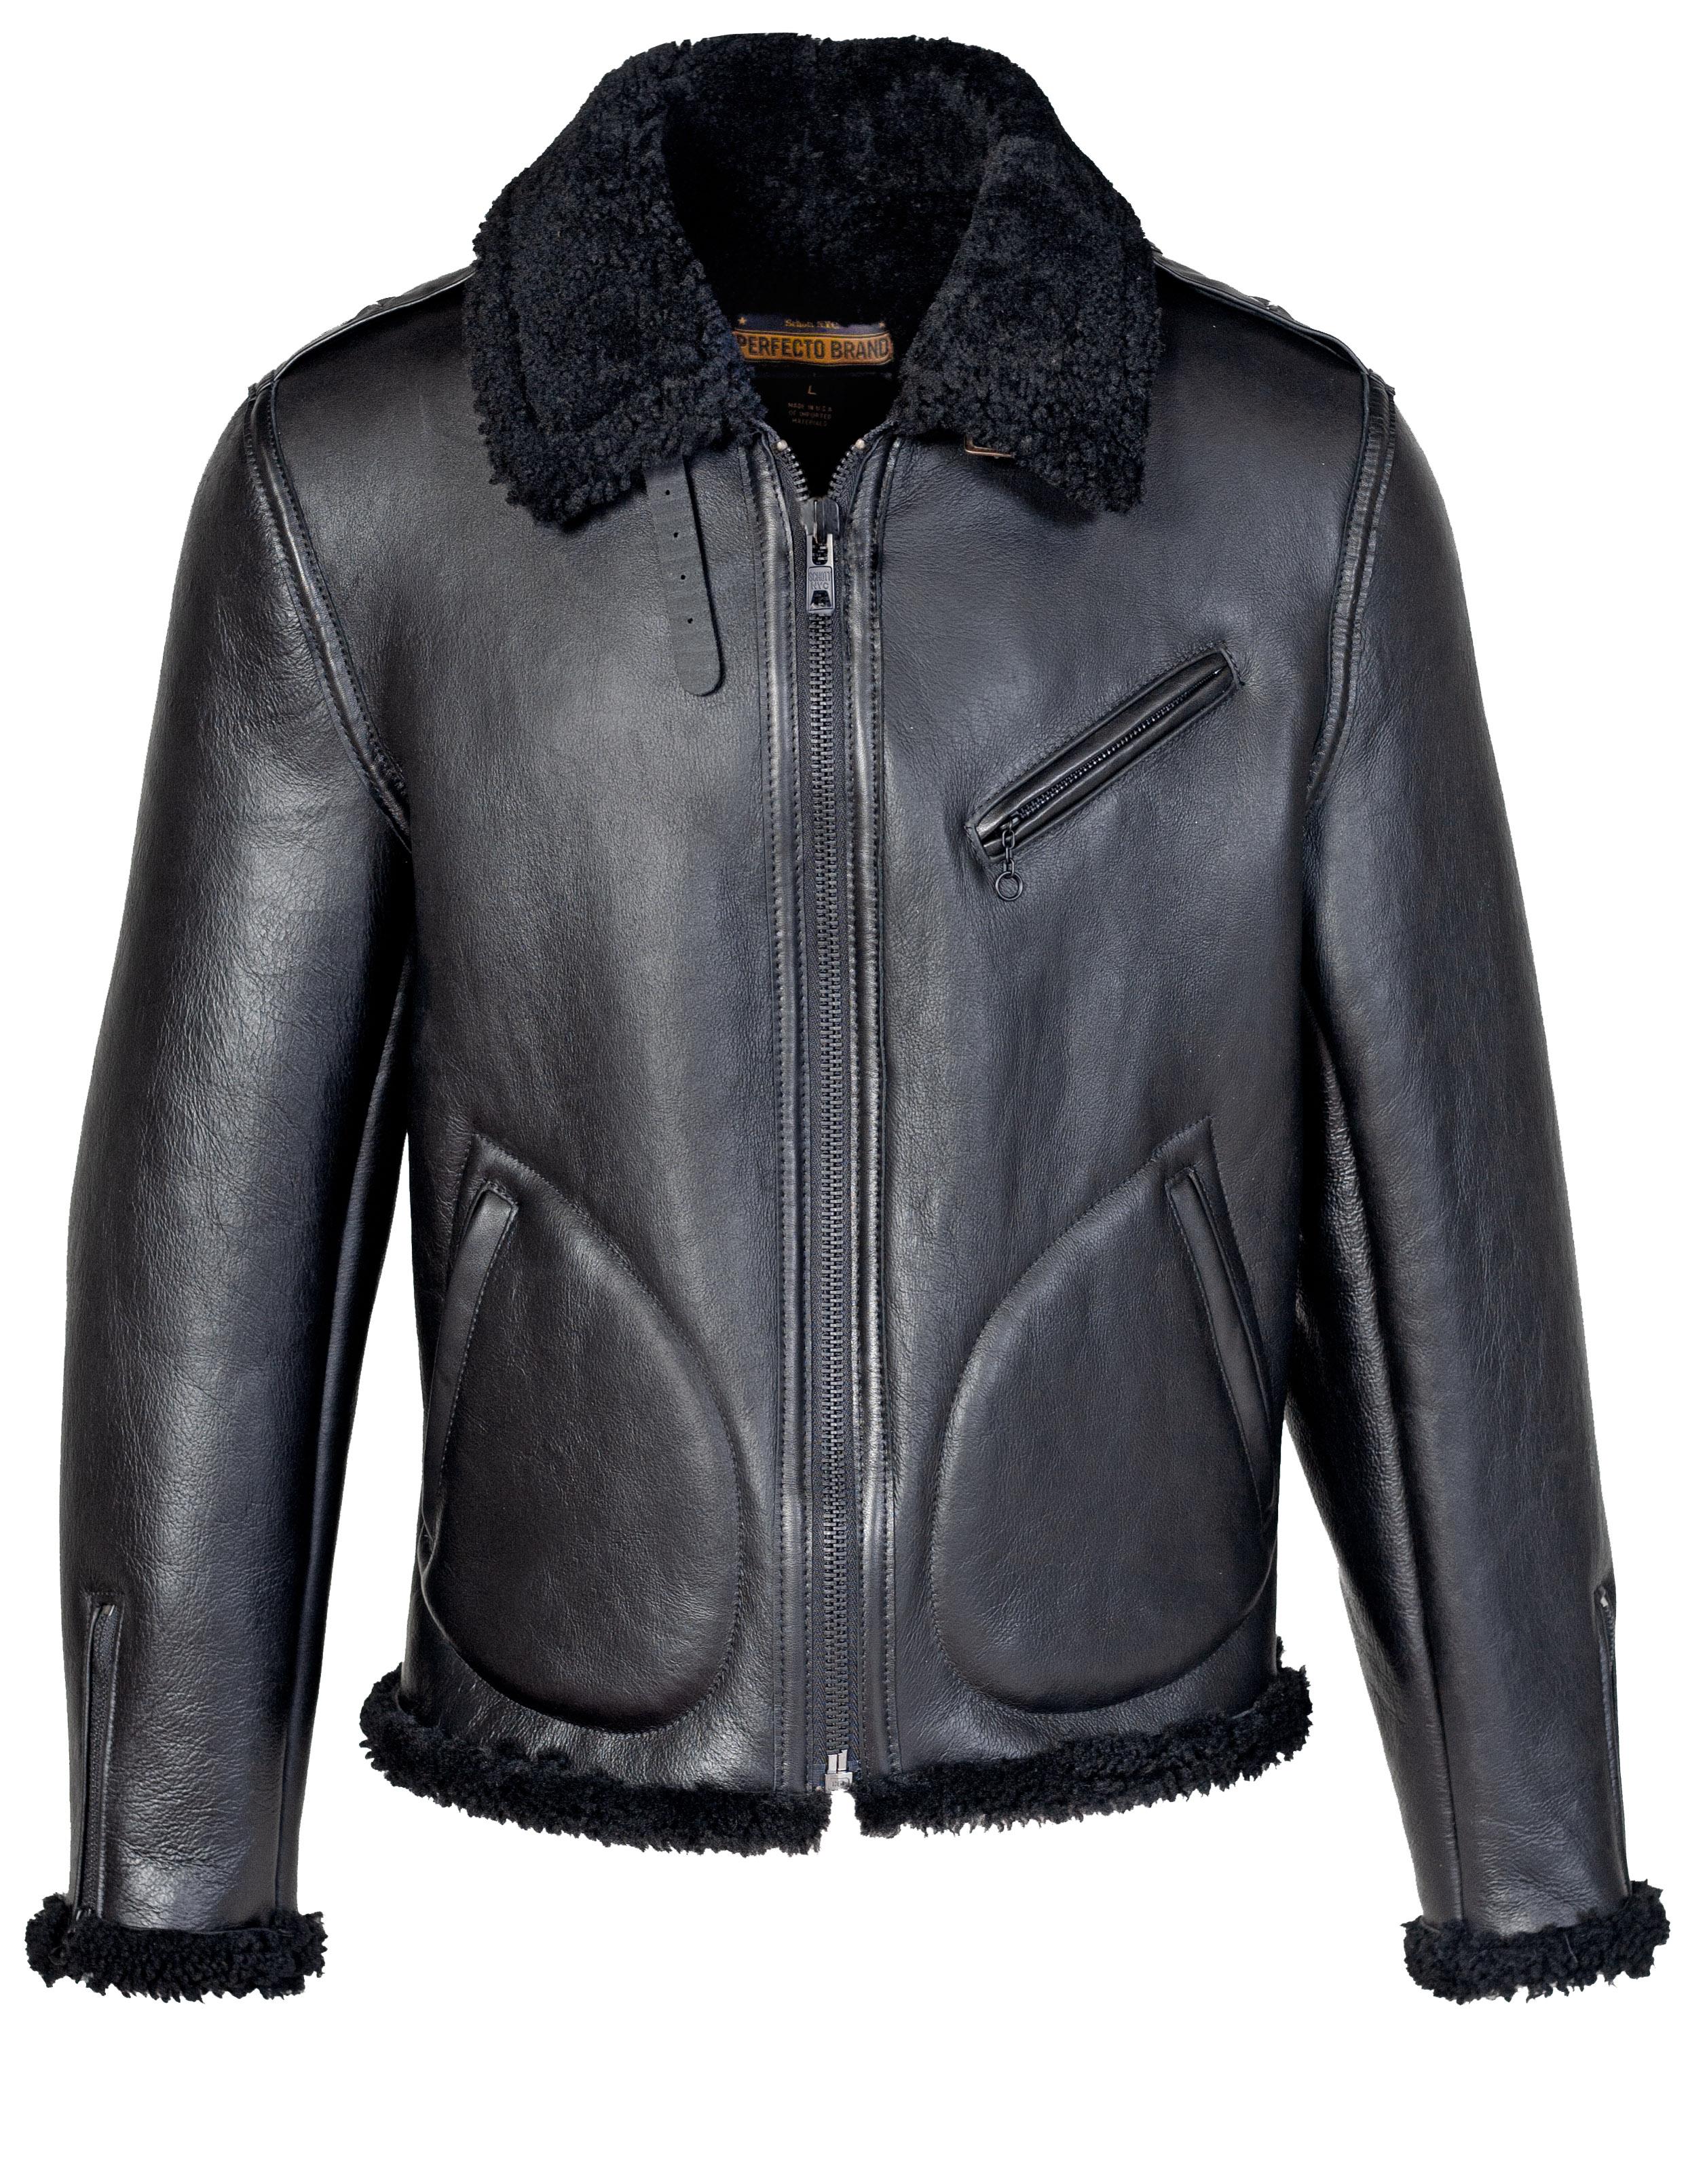 Perfecto® Brand P216S Men's Genuine Sheepskin Biker Jacket